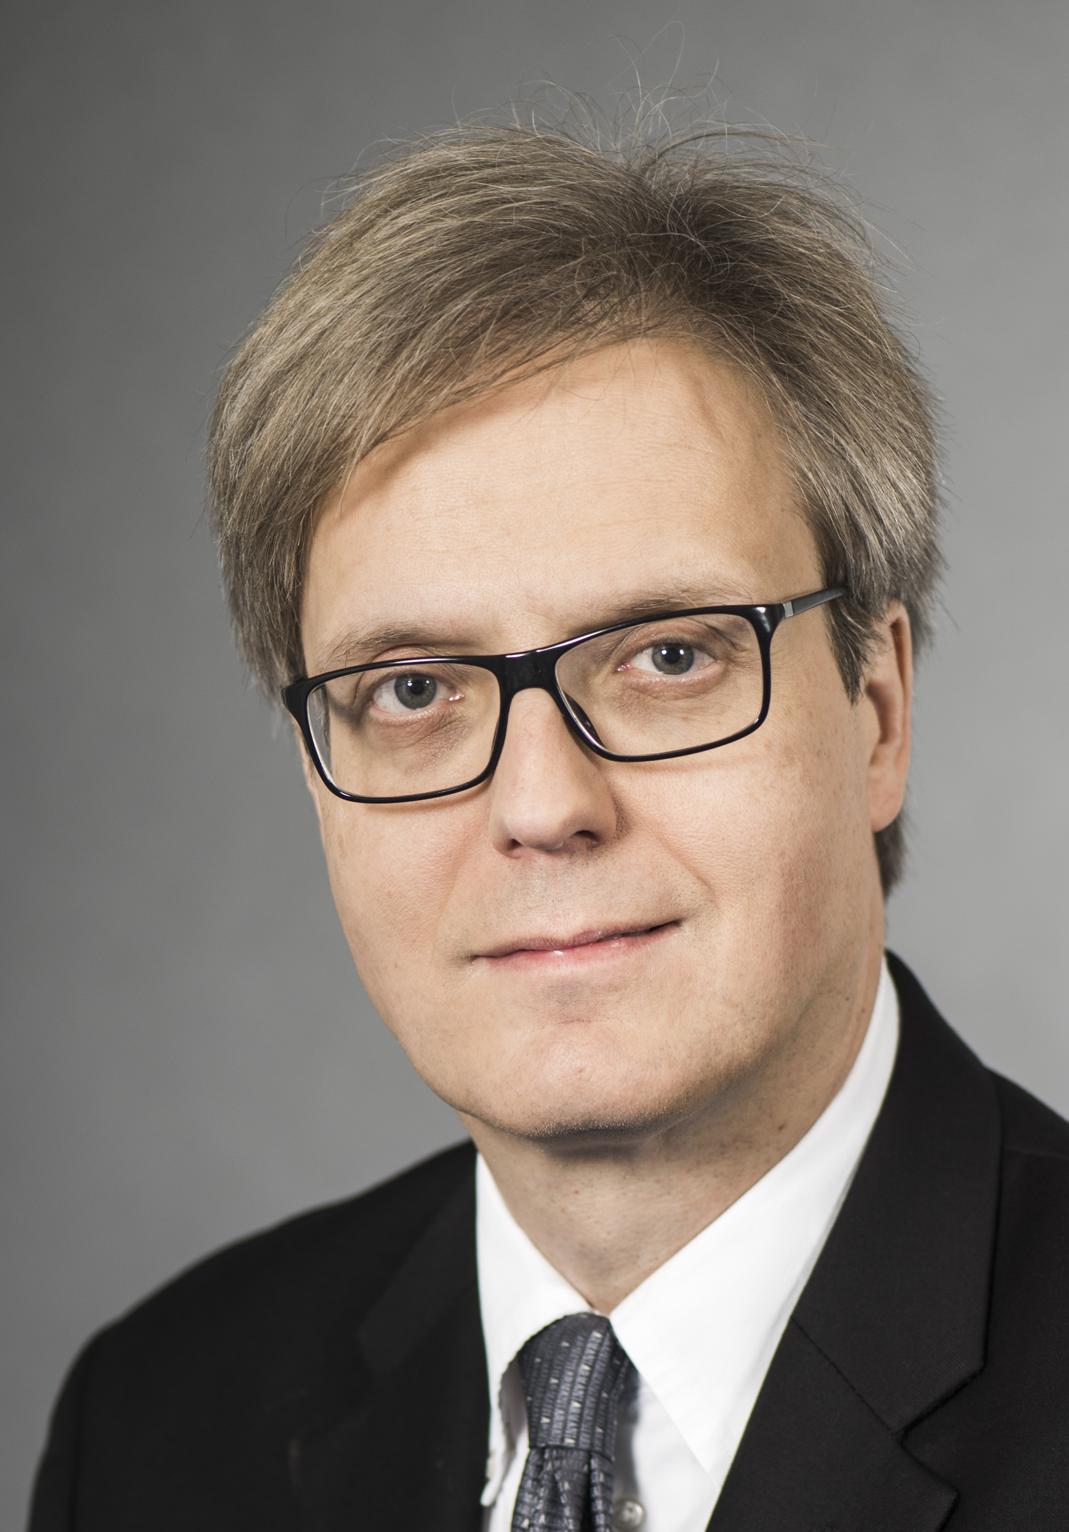 Karl-Olof  <span>Loevblad</span>